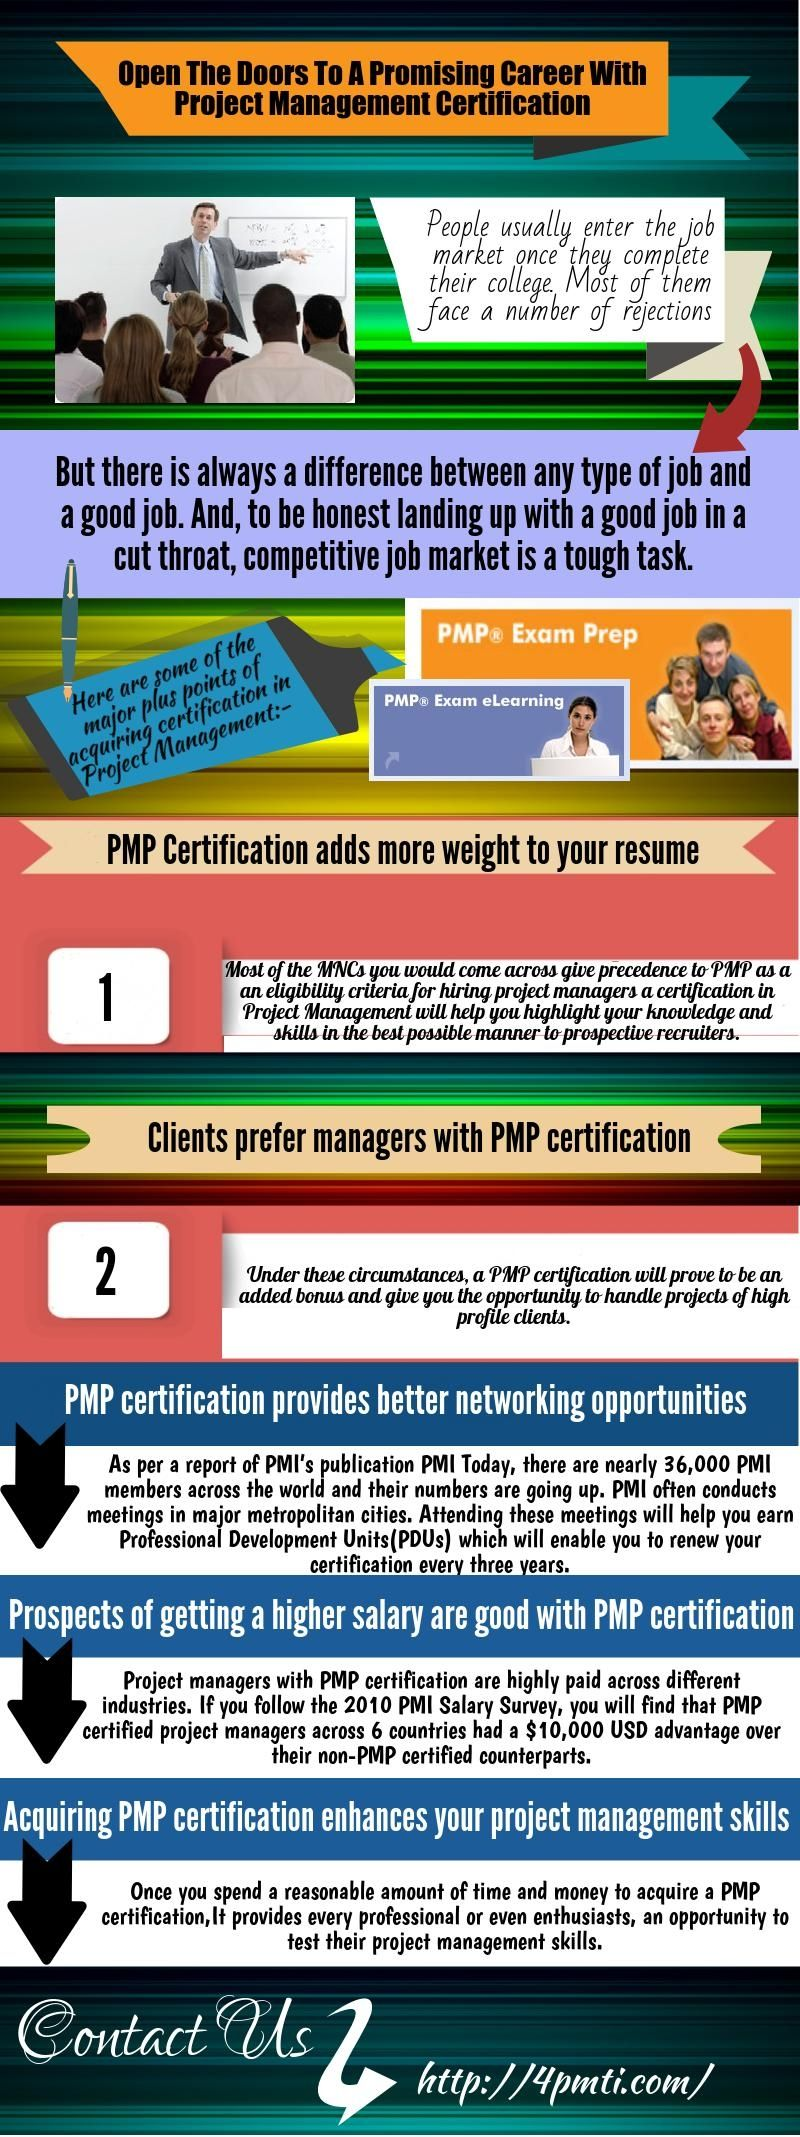 Acquiring pmp certification enhances your project management acquiring pmp certification enhances your project management skills once you spend a reasonable amount of time xflitez Images